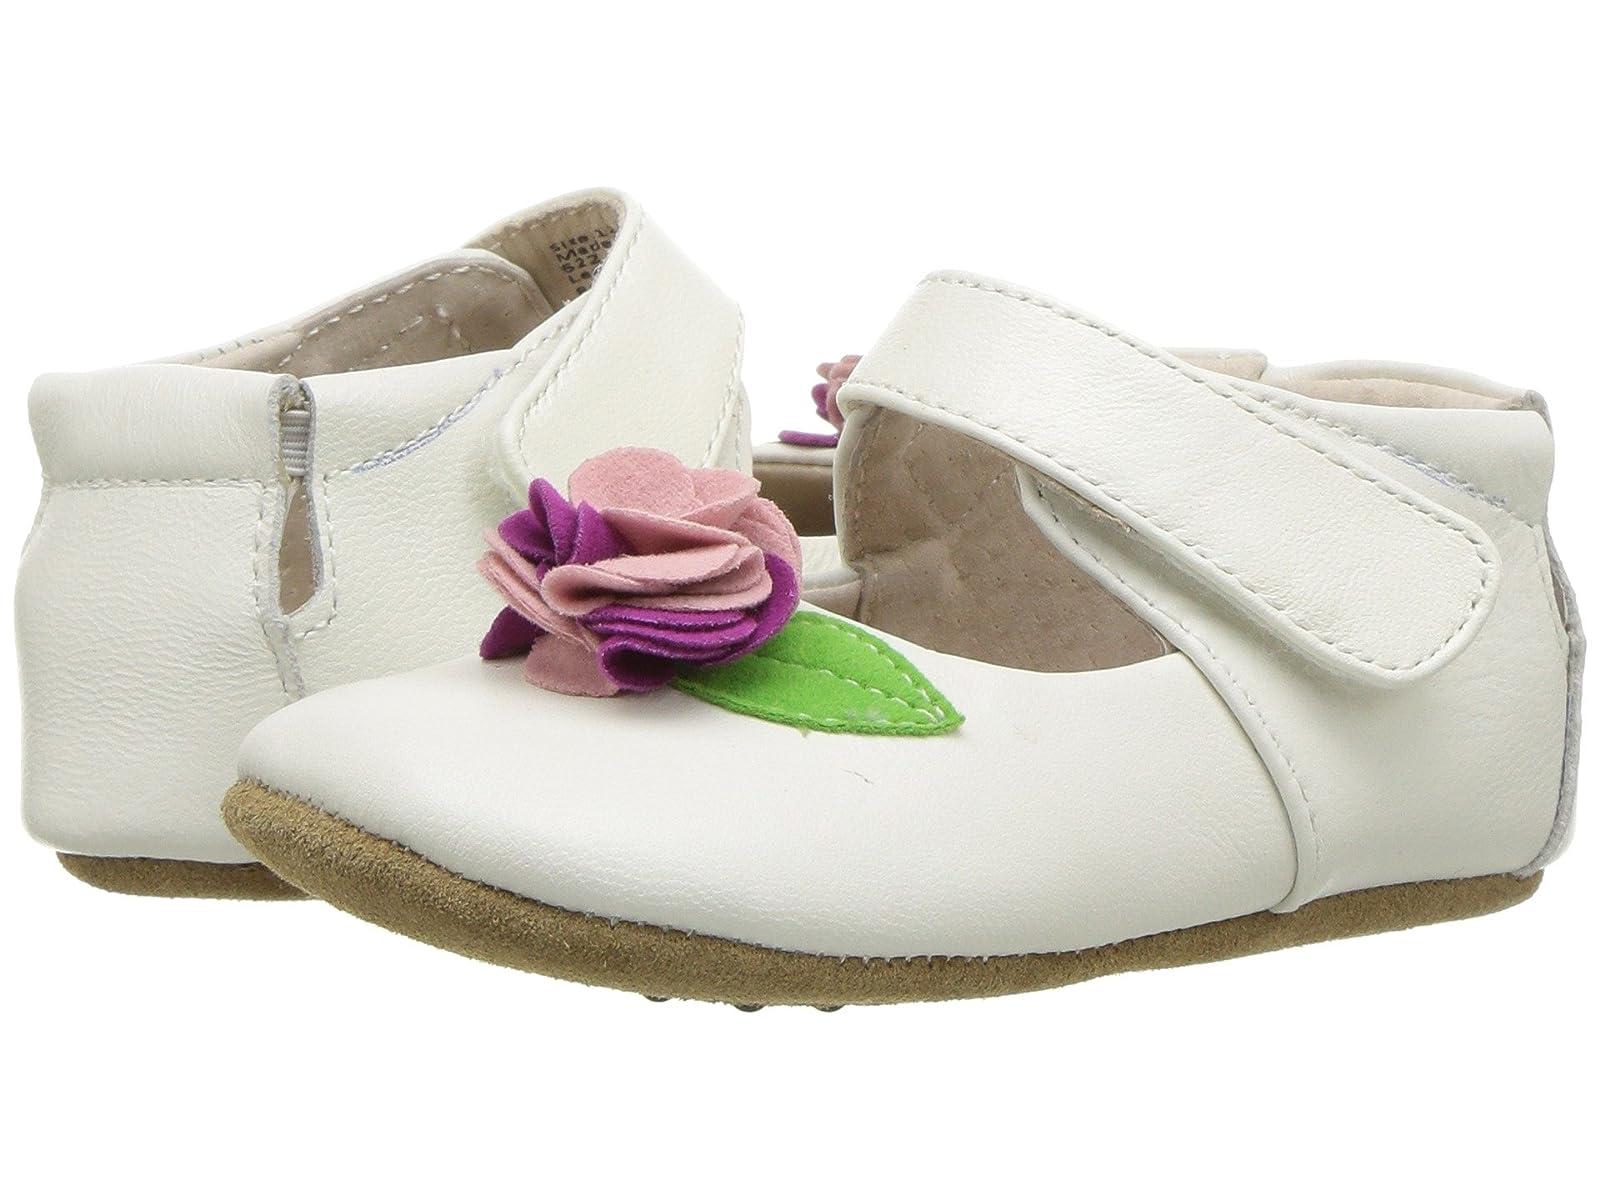 Livie & Luca Rosa (Infant)Atmospheric grades have affordable shoes